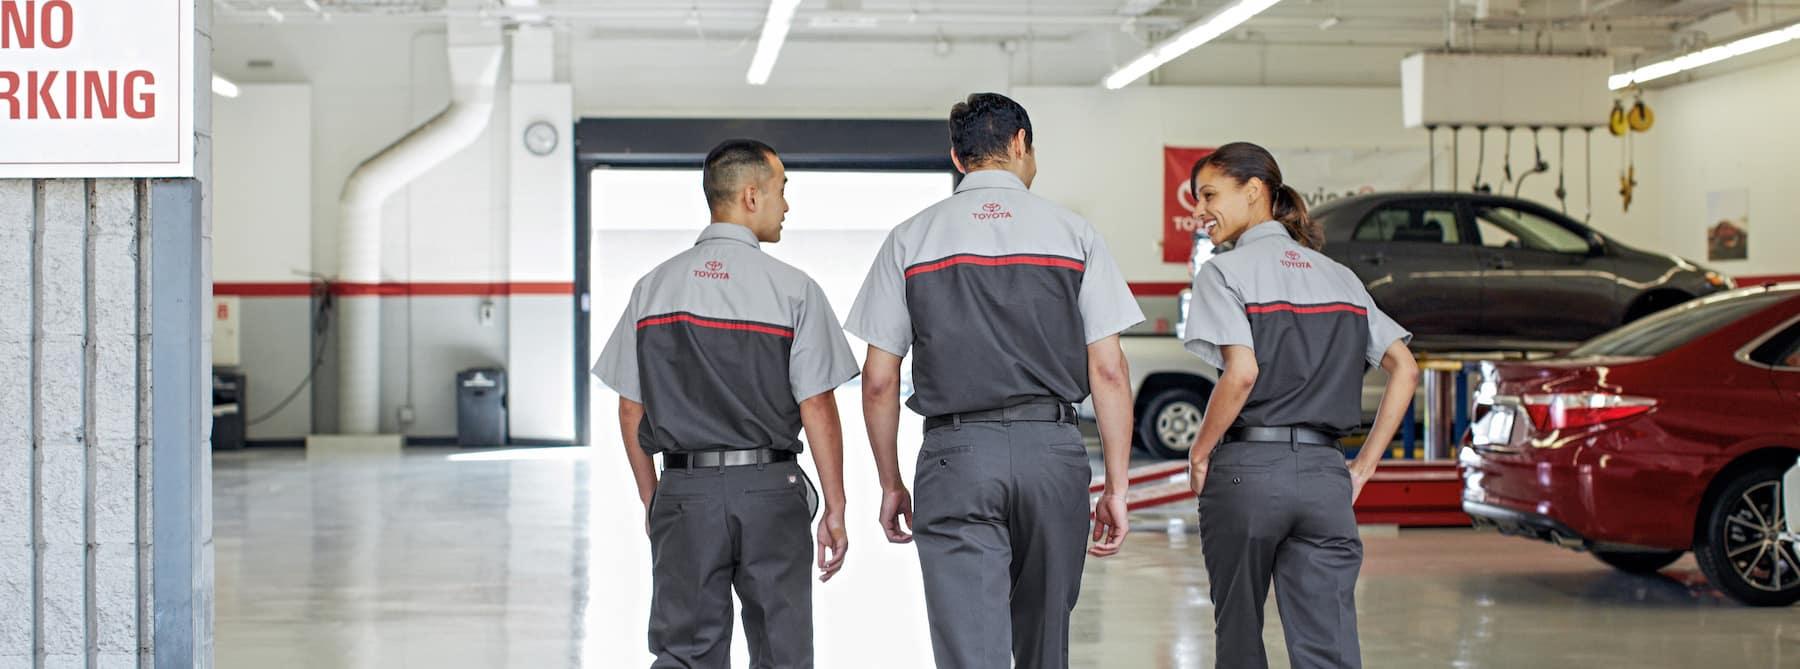 Halterman's Toyota is a Toyota Dealership near Saylorsburg, PA | Toyota Service Technicians walking together in garage